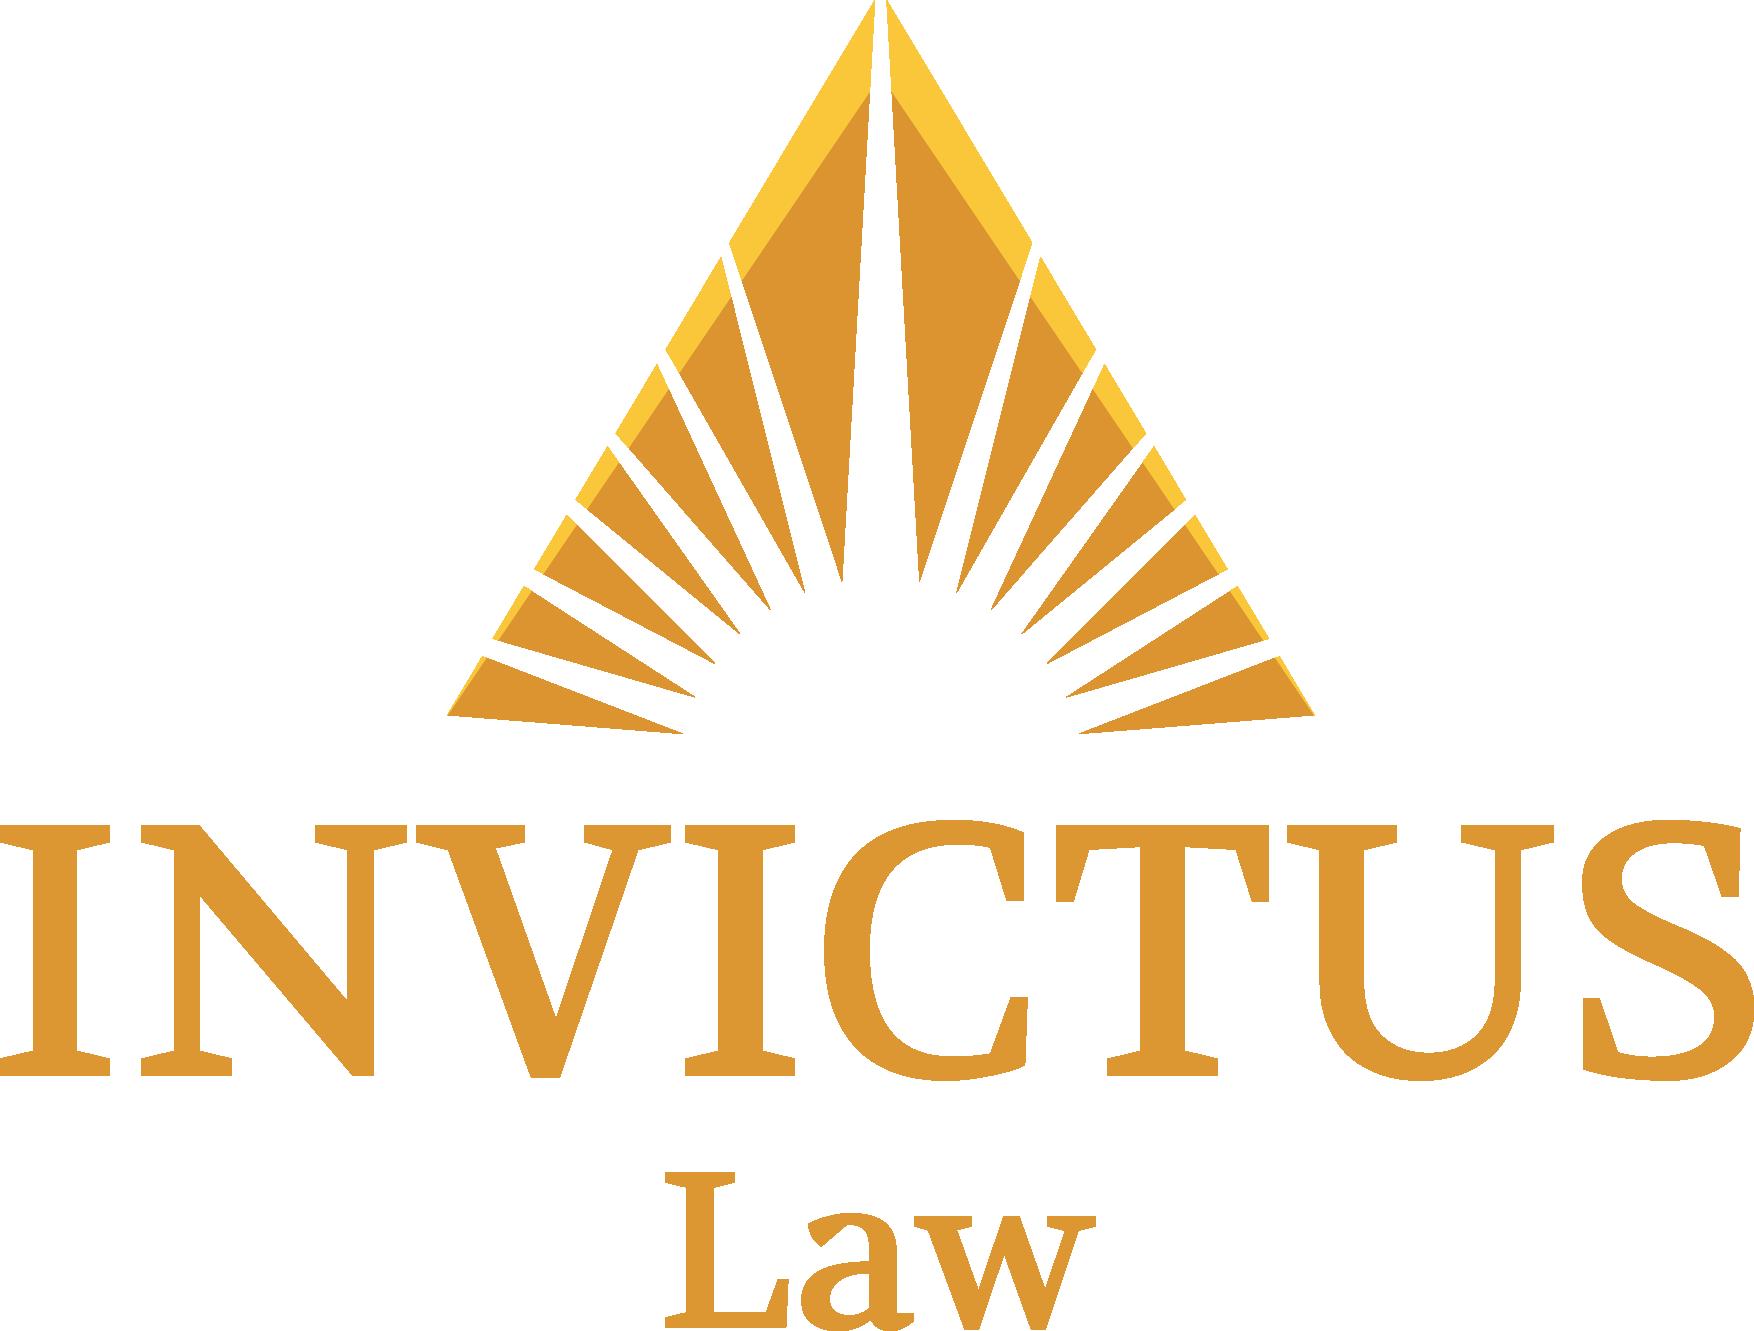 Invictus Law